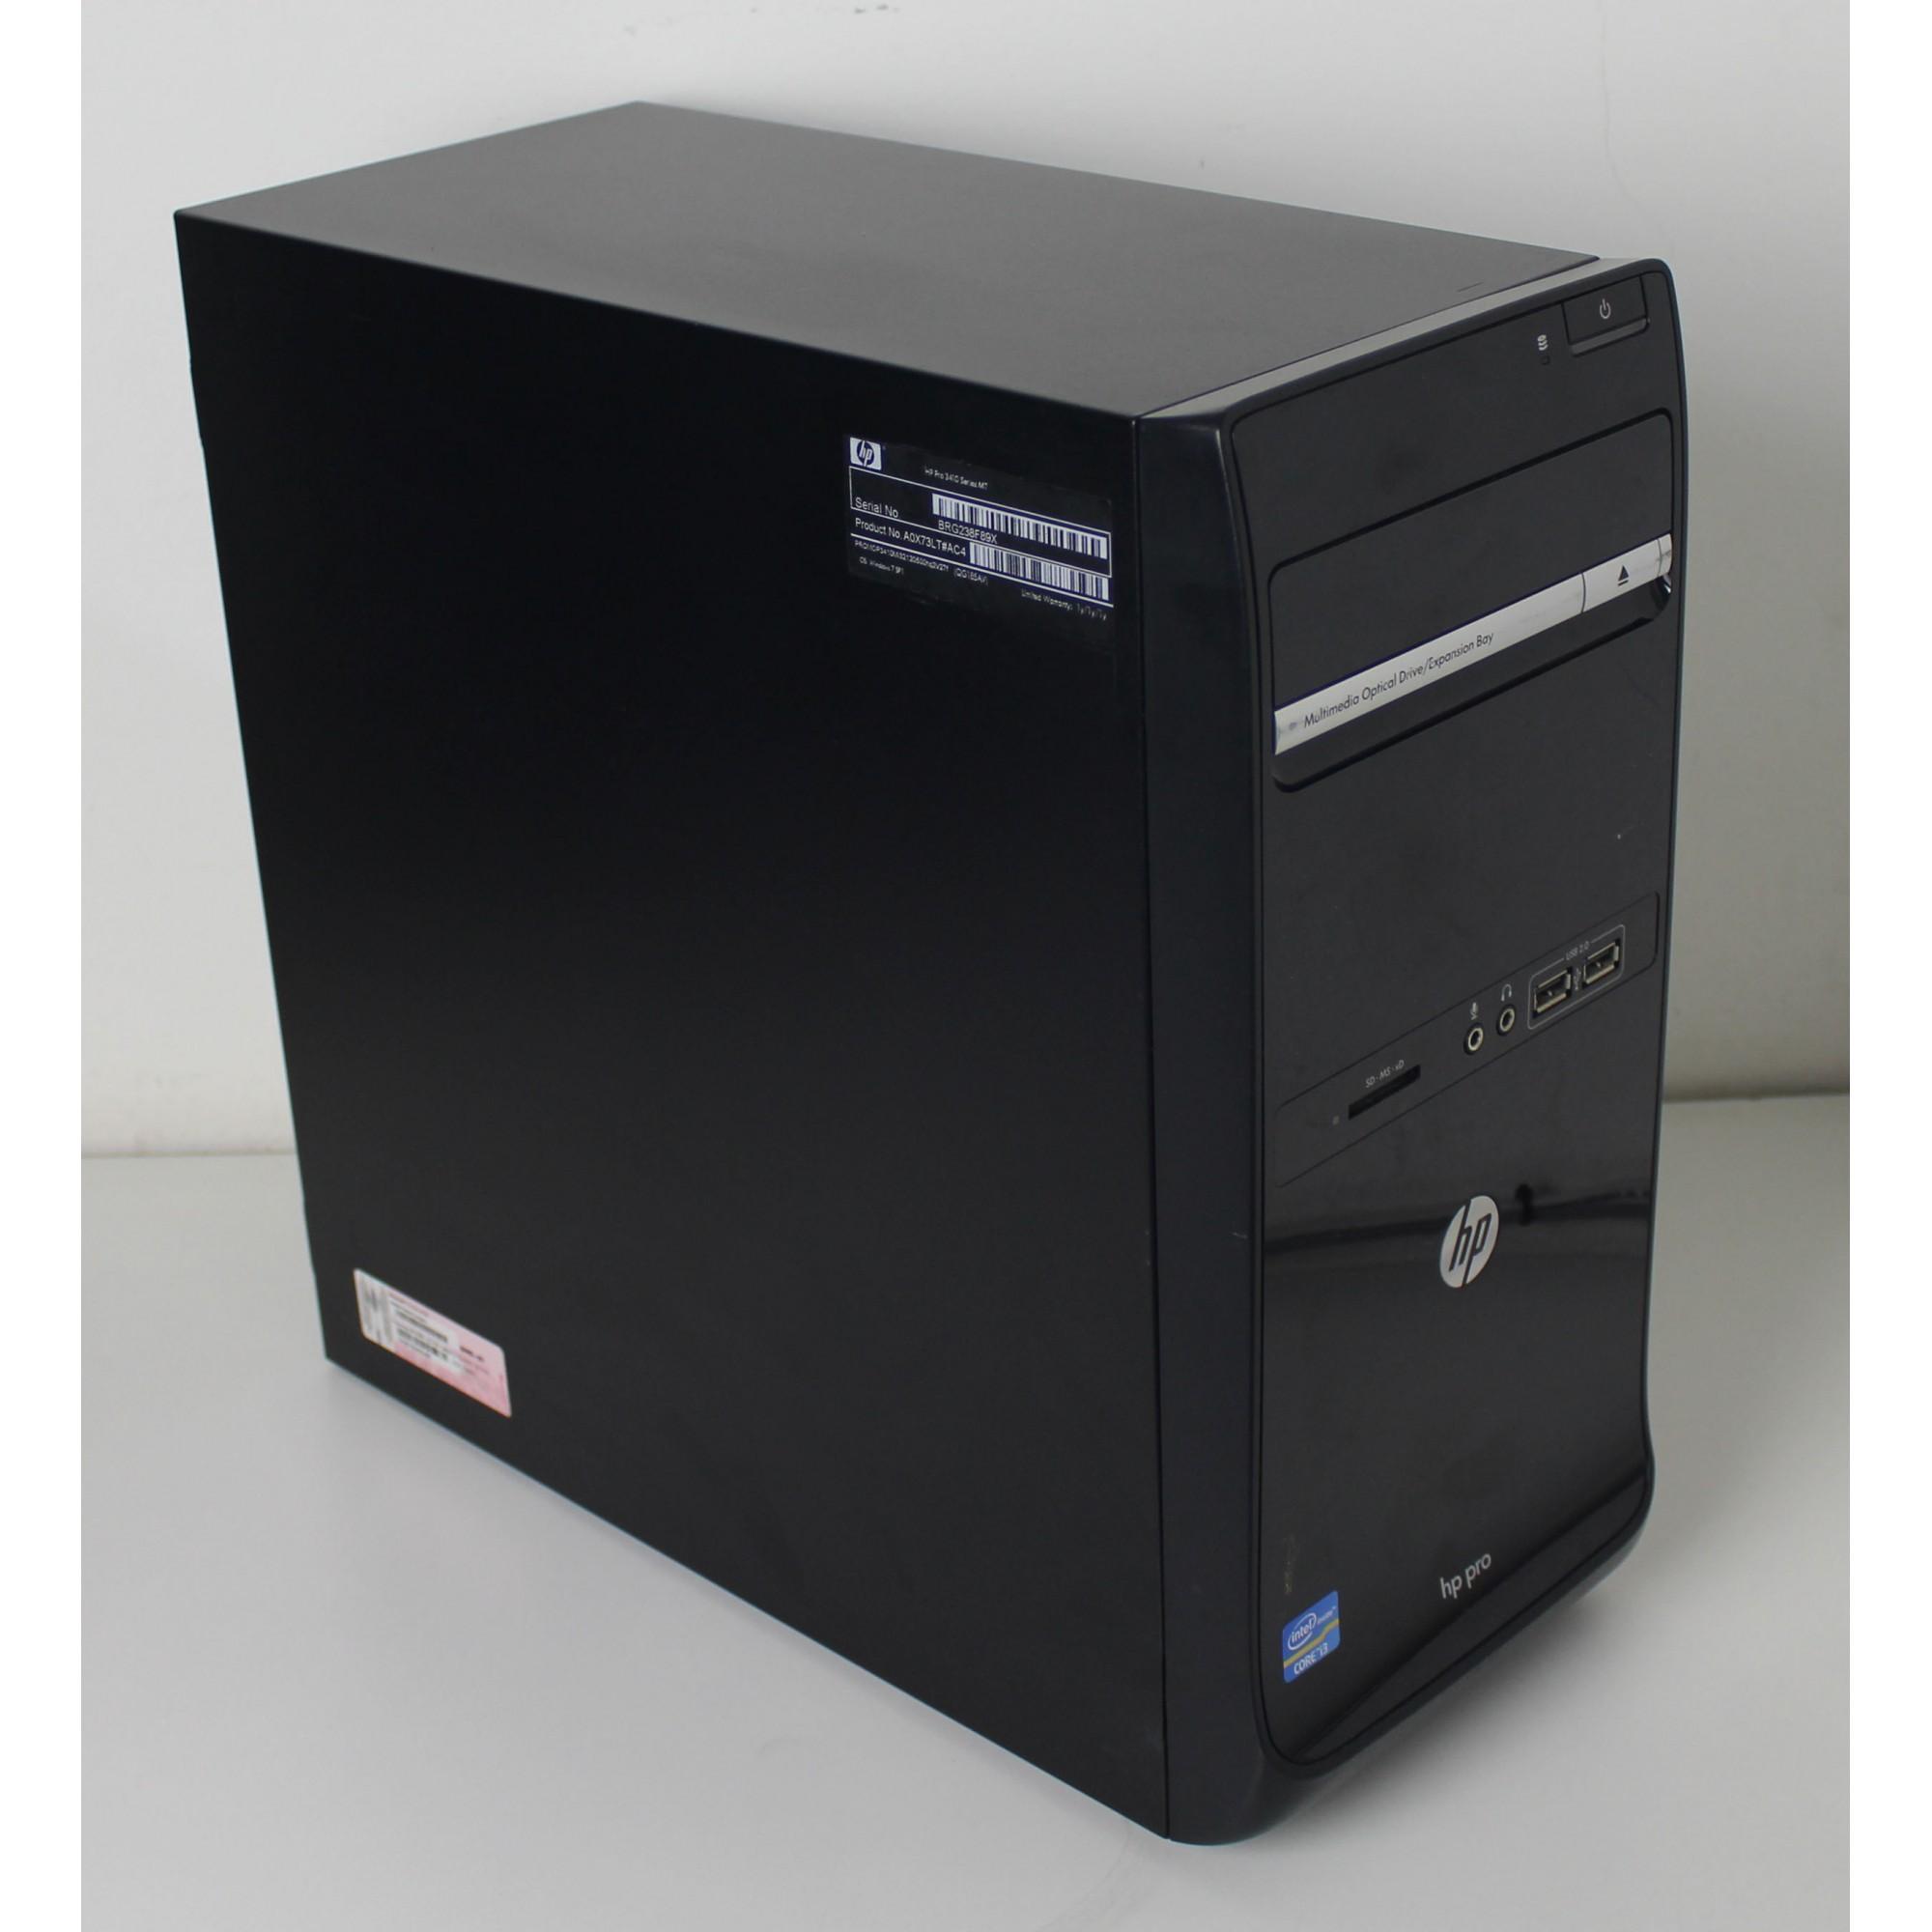 CPU HP 3410 Pro Intel Core i3 3.3Ghz 4GB HD-500GB